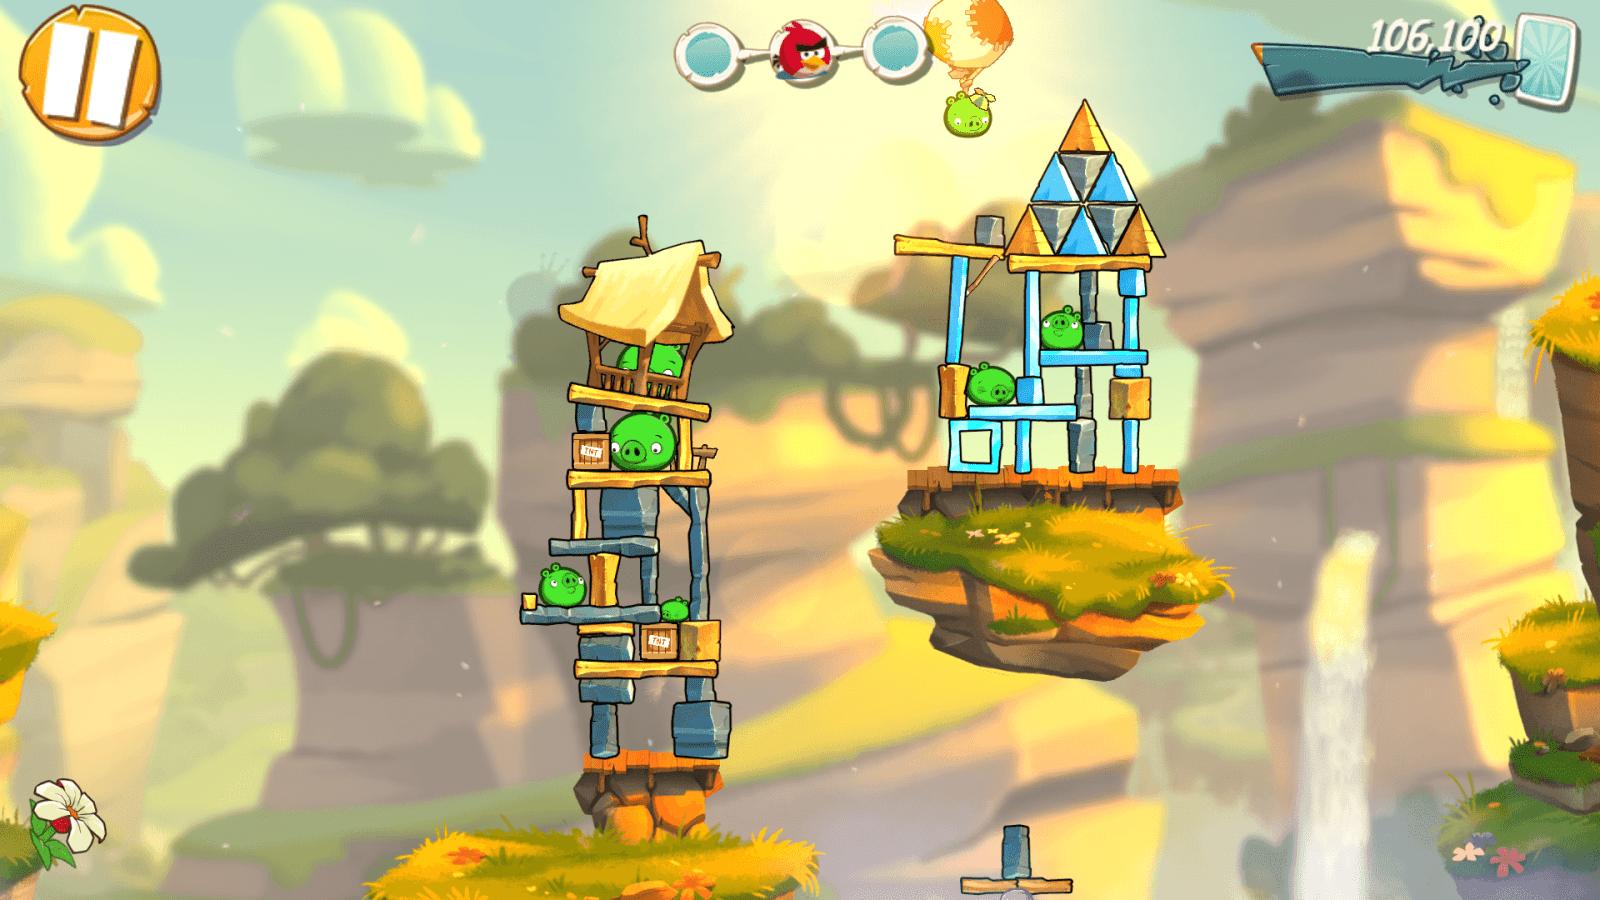 Screenshot 2015 08 19 23 20 22 - Обзор Angry Birds 2